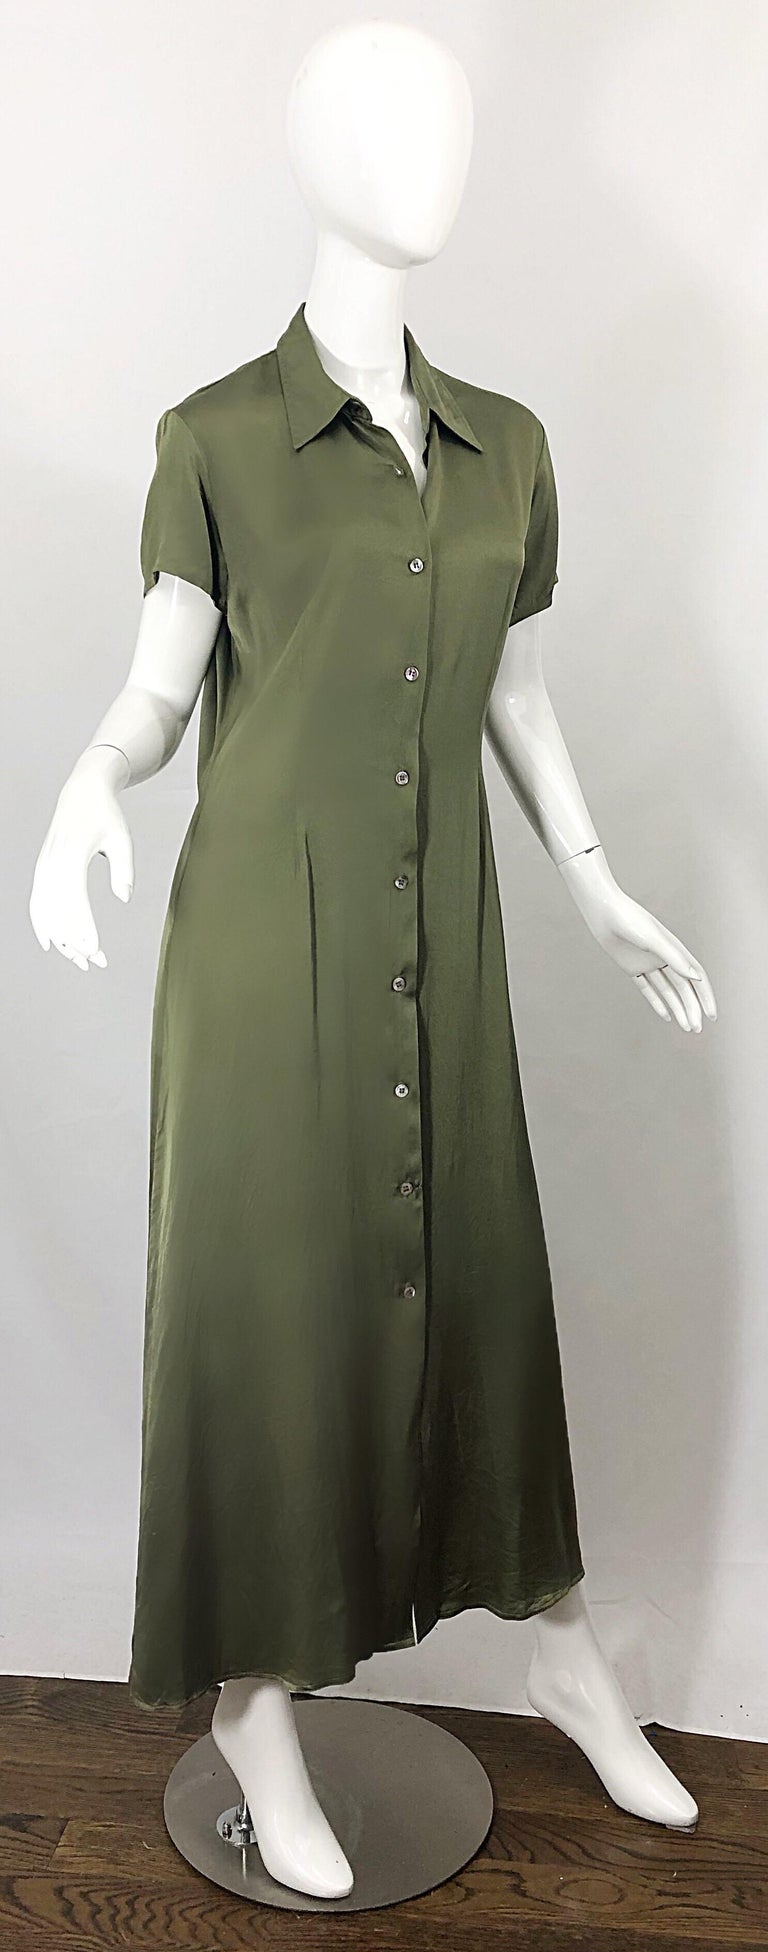 1970s Halston Olive Green Liquid Silk Vintage 70s Short Sleeve Maxi Shirt Dress For Sale 3